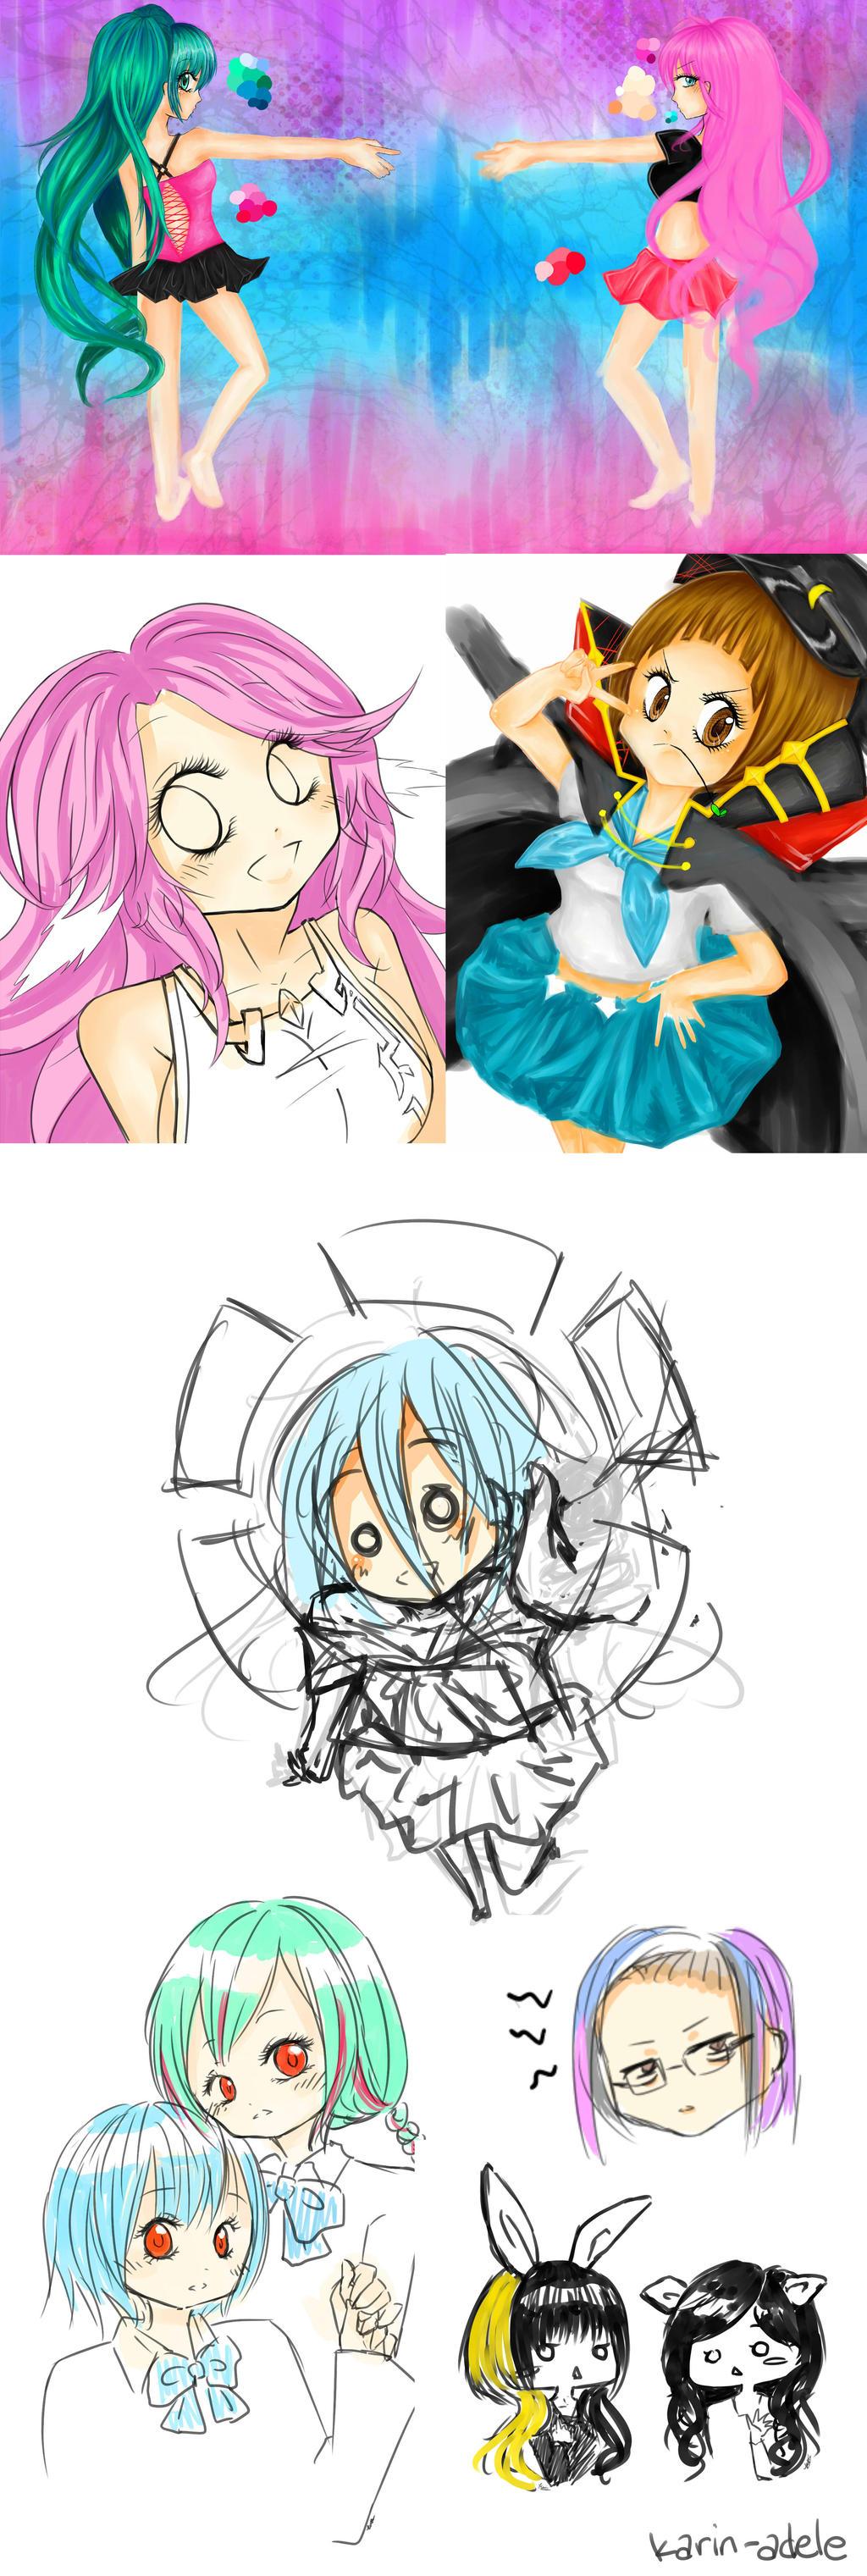 scrap_doodle_dump_1_by_karin_adele-d7lup